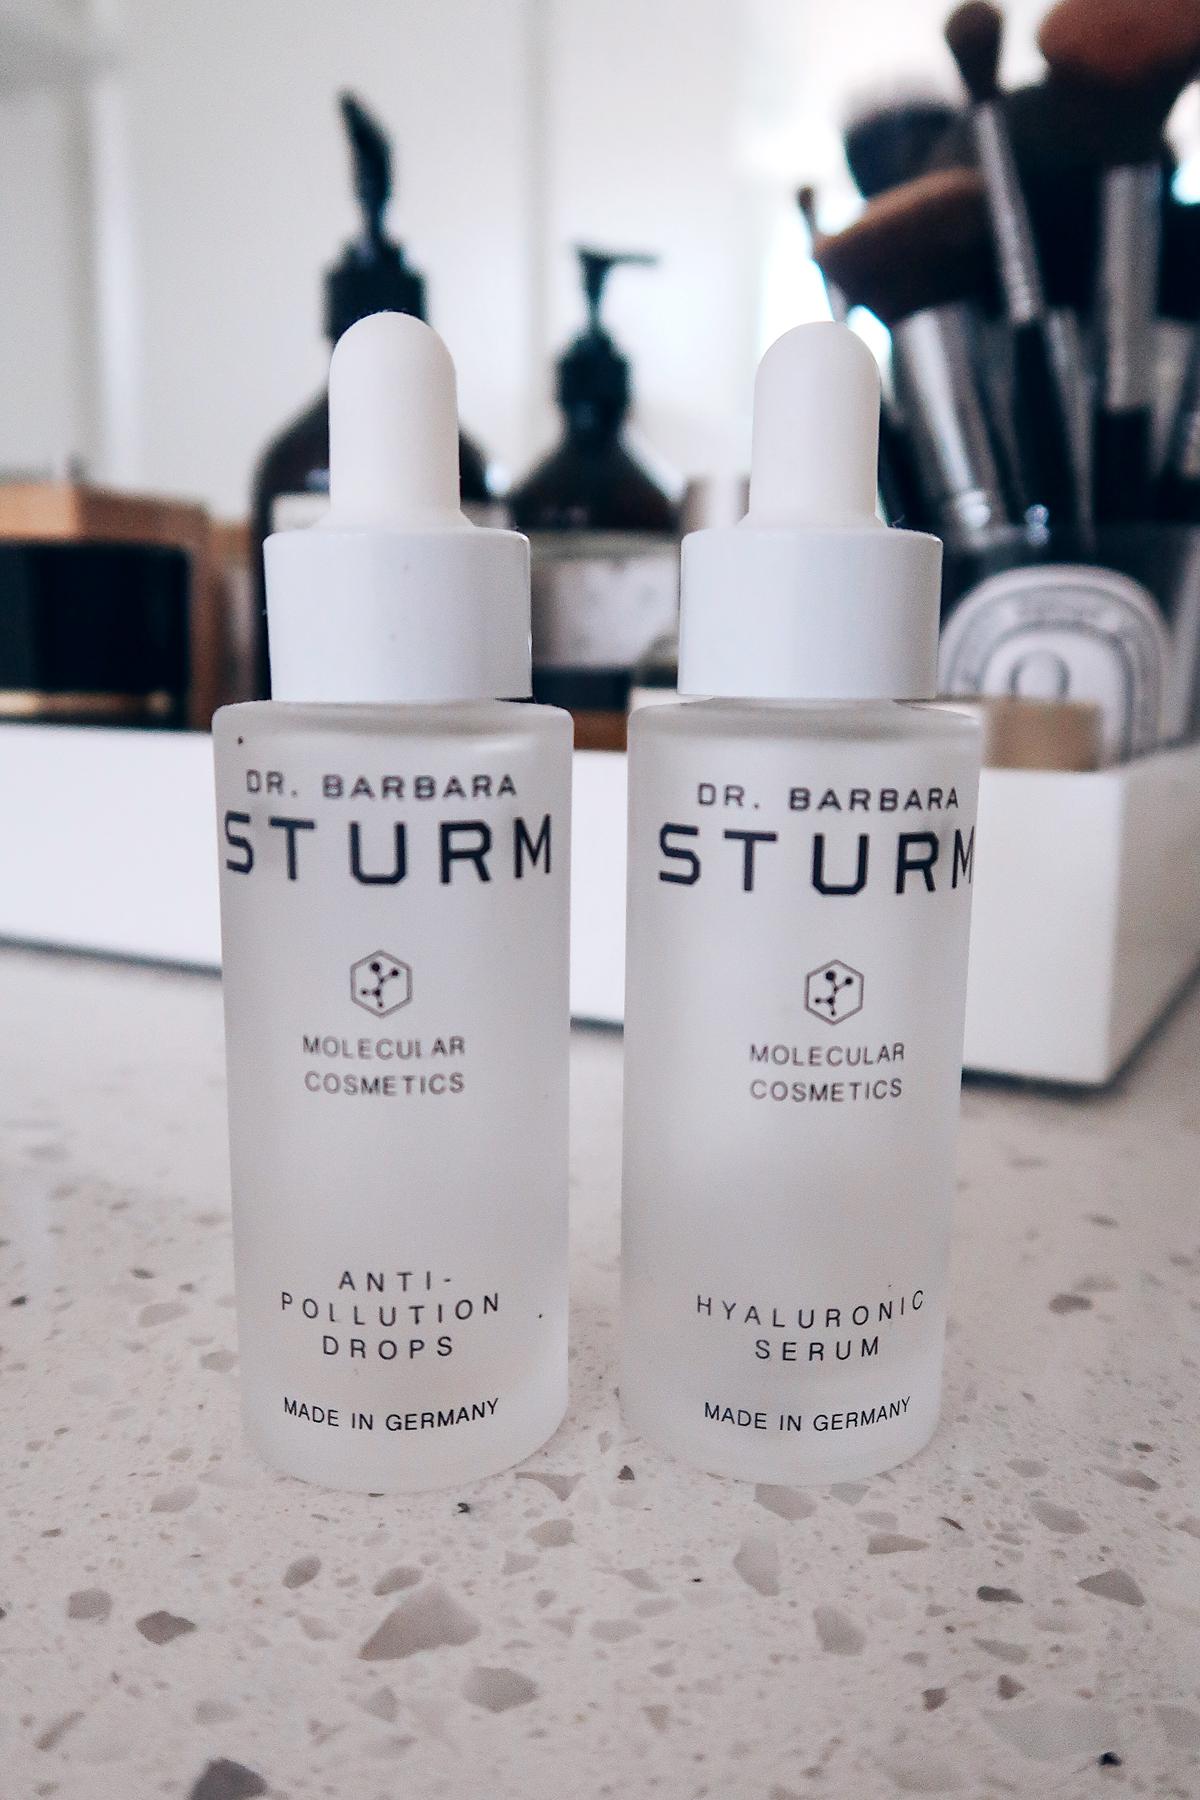 Fashion Jackson Skincare Routine Dr Barbara Sturm Anti Pollution Drops Hyaluronic Serum